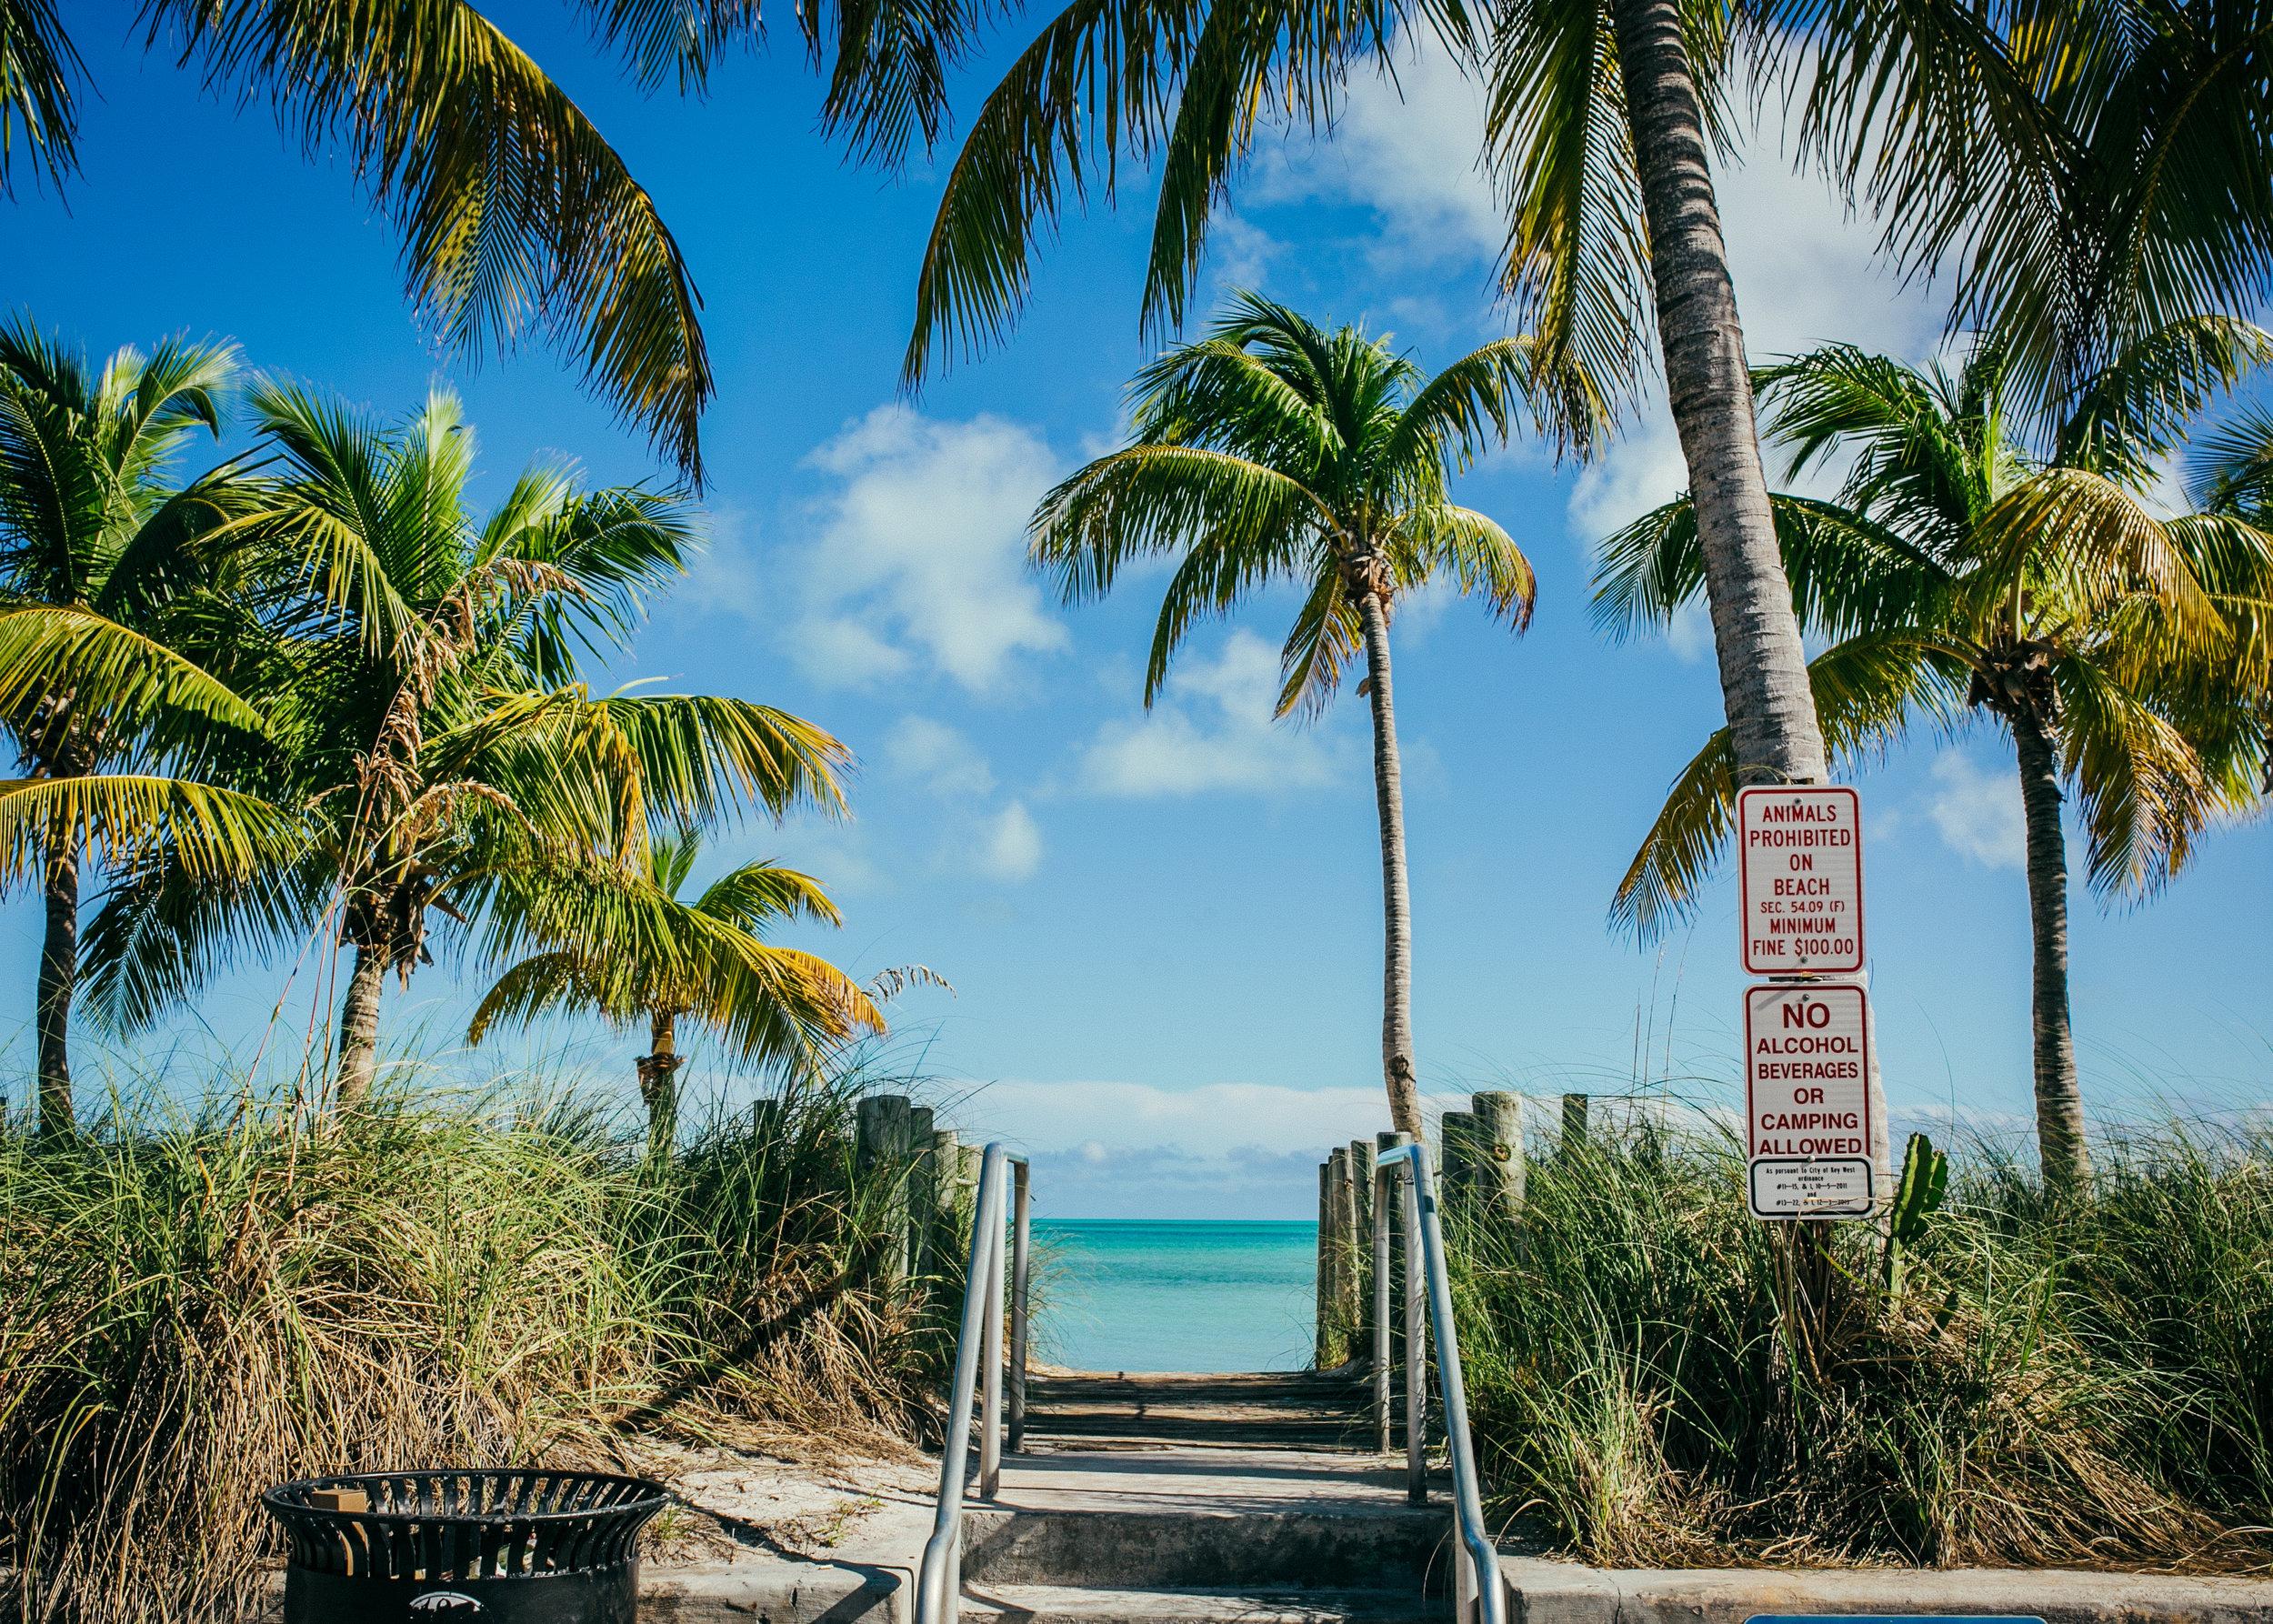 key west smathers, visit florida, key west photographer, lena perkins, white street, bicycle, white street pier, cayo hueso, island, tropics, palm tree, beach, key west wedding.jpg